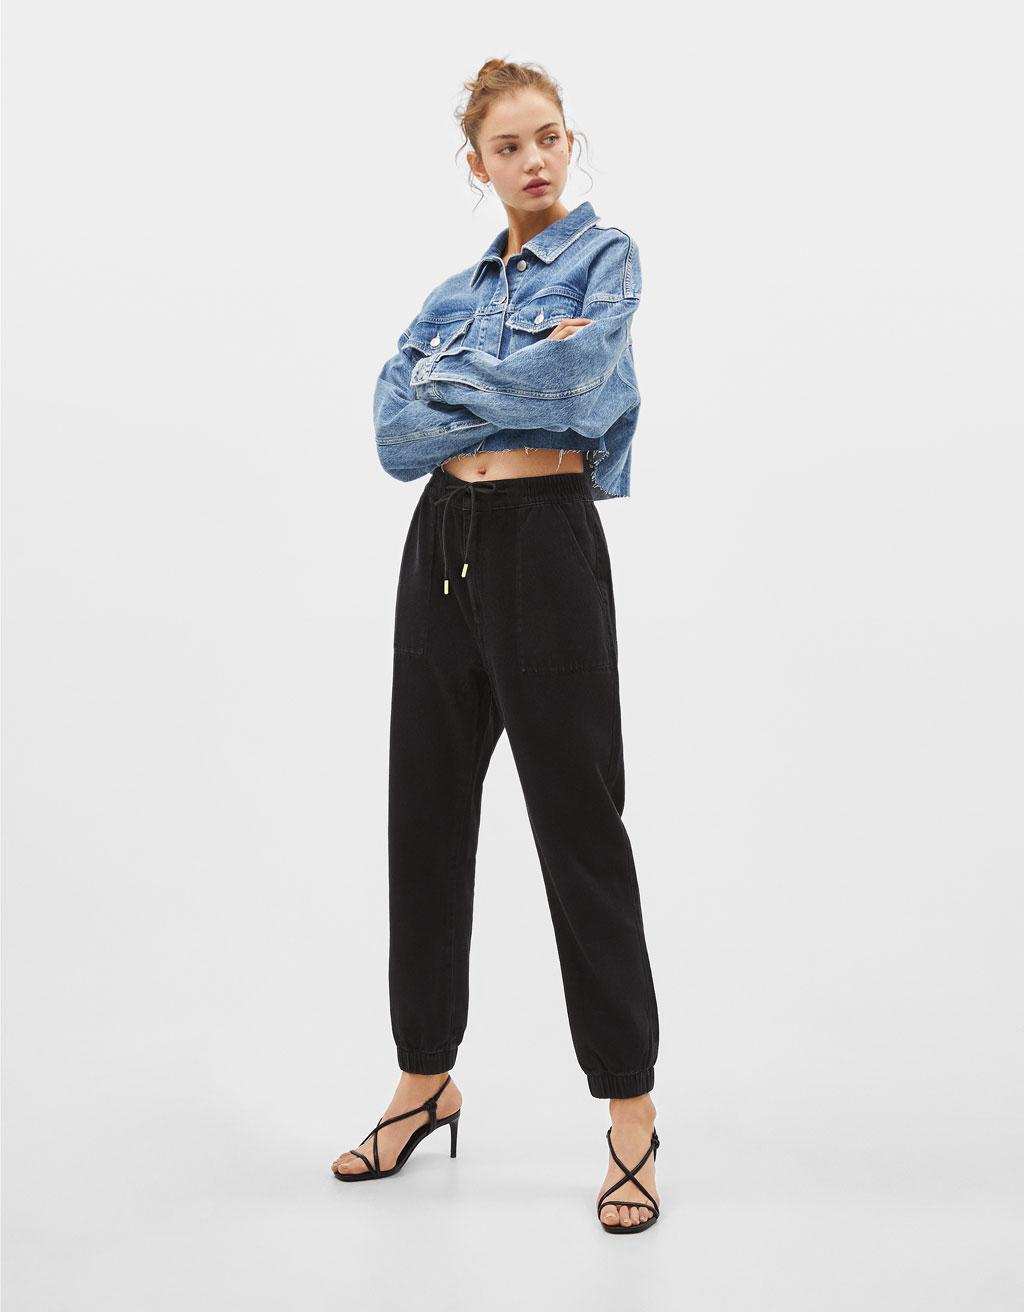 Pantalon de jogging en jean